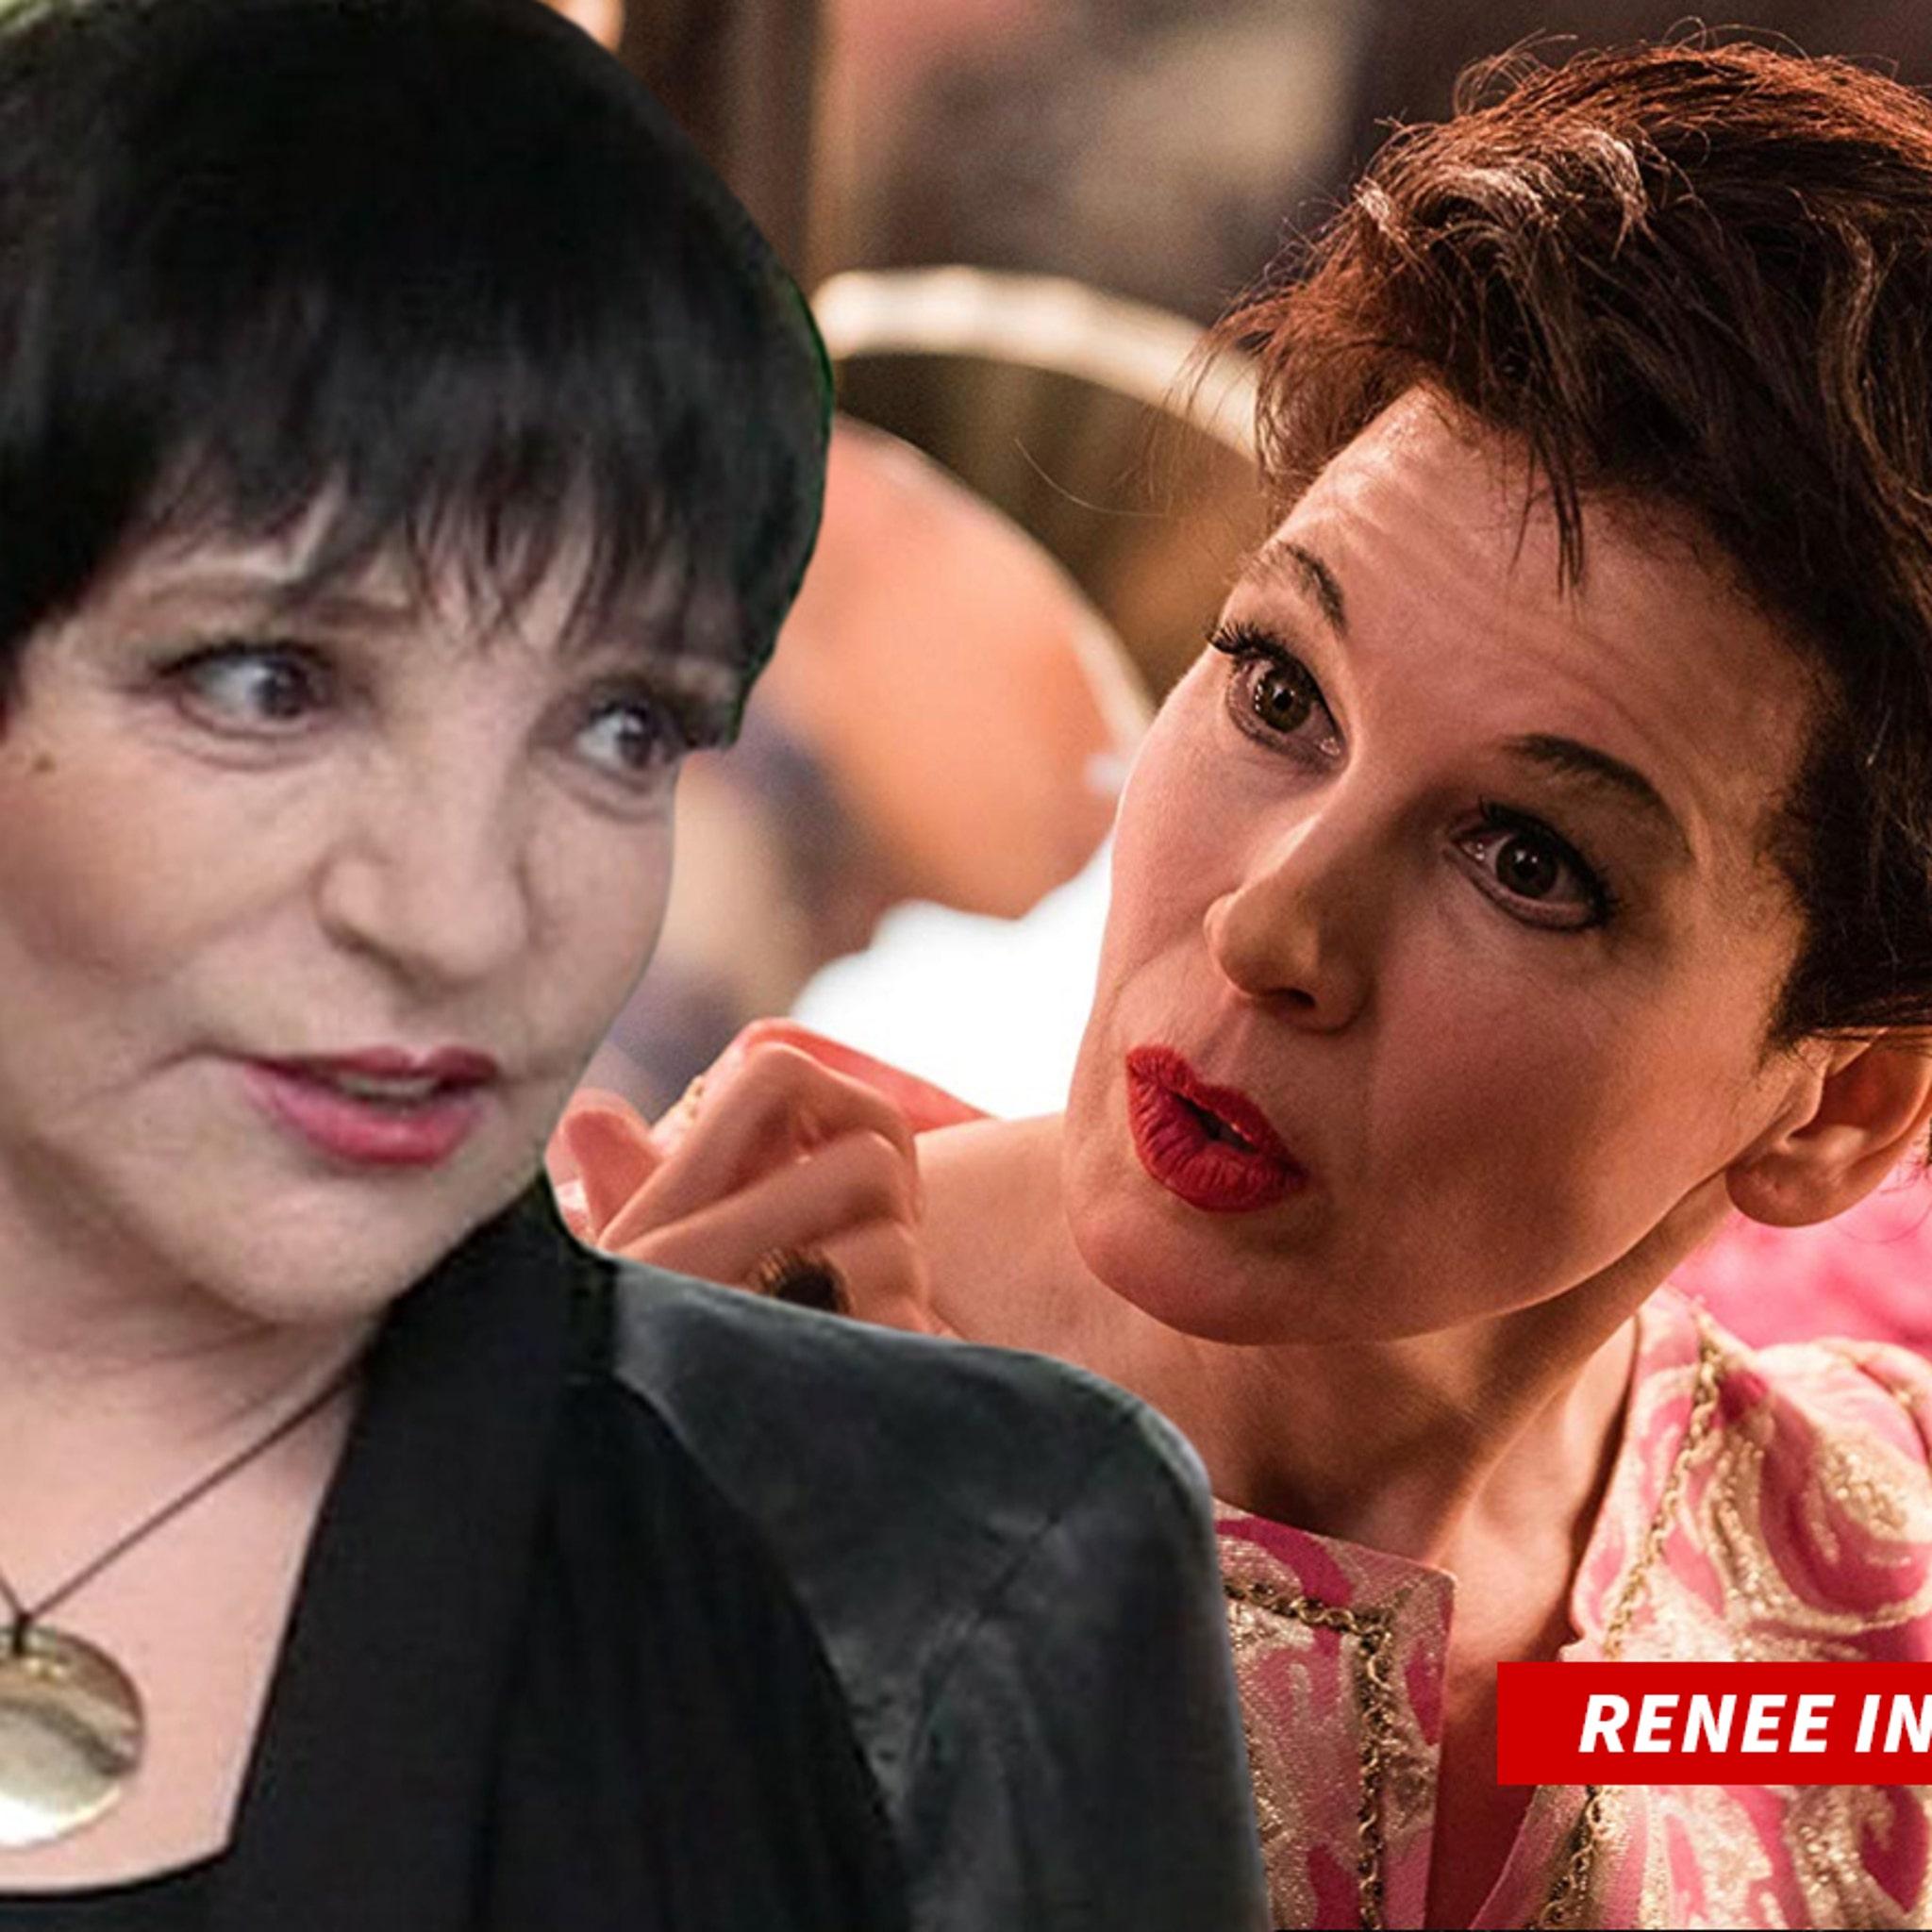 Liza Minnelli Won't See 'Judy' But No Shade at Renee Zellweger